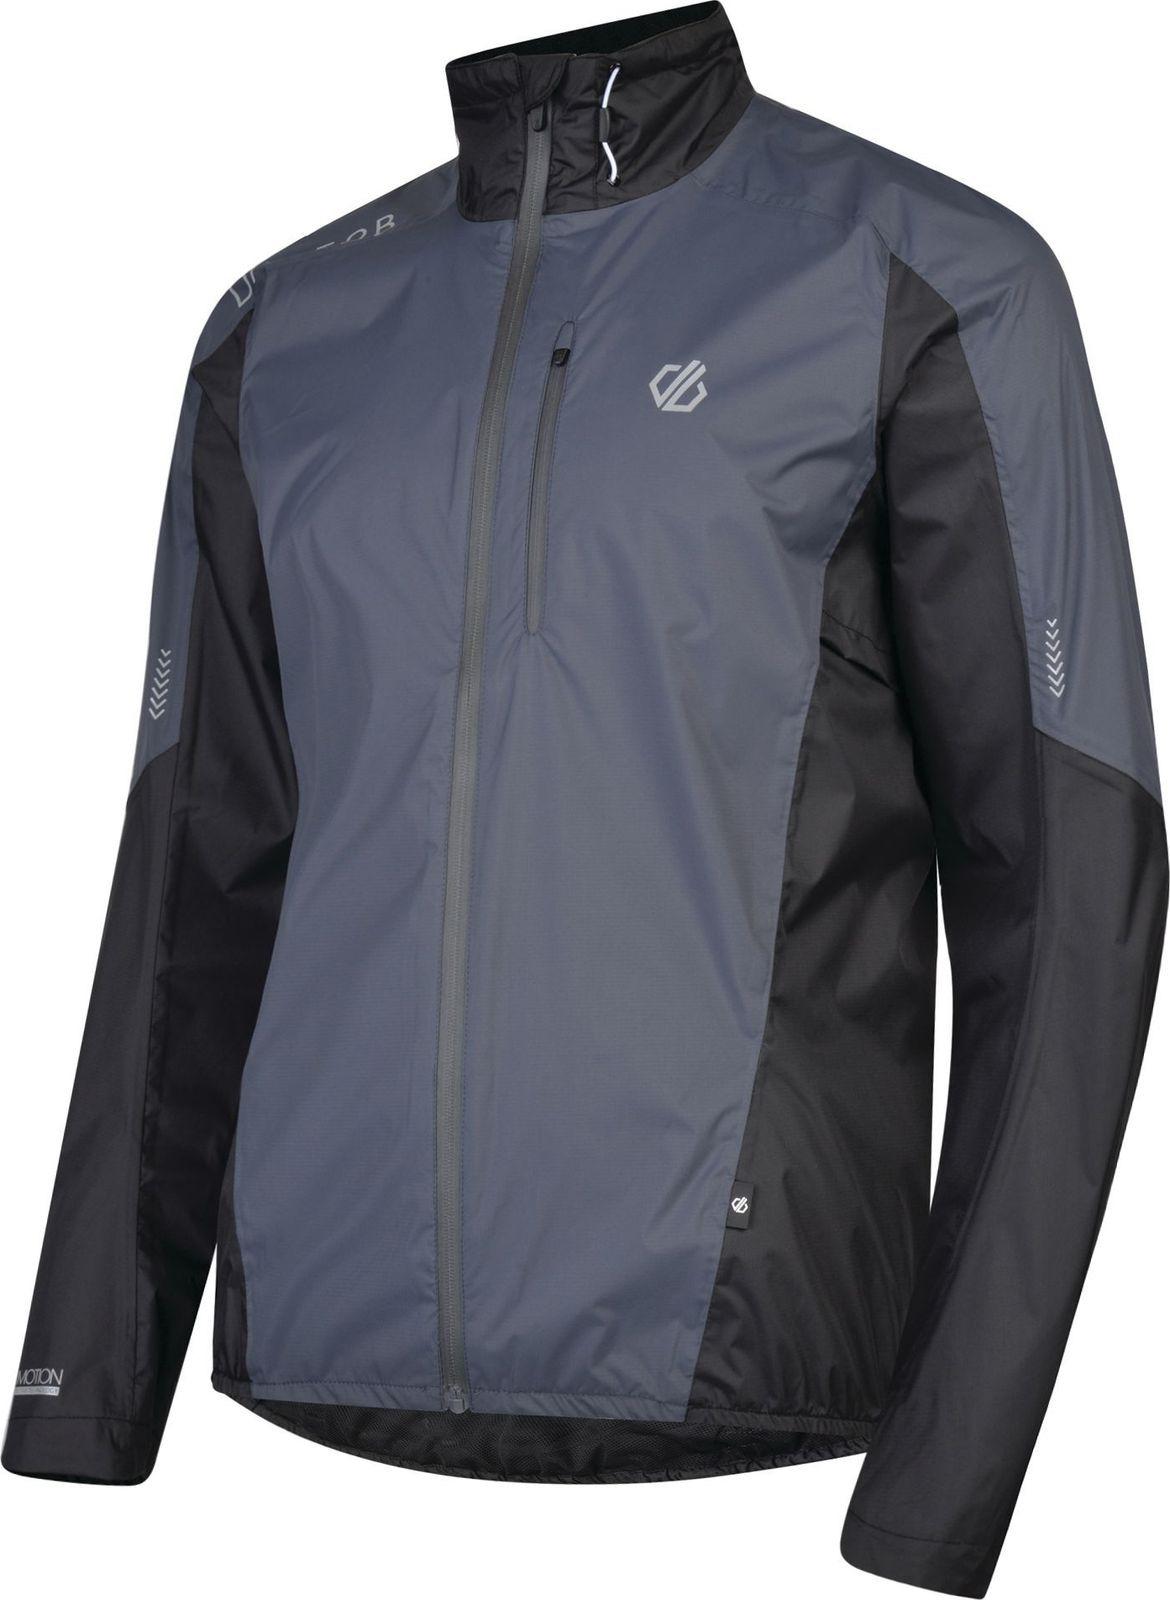 Велокуртка мужская Dare 2b Mediant Jacket, цвет: серый. DMW456-9QV. Размер XL (56)